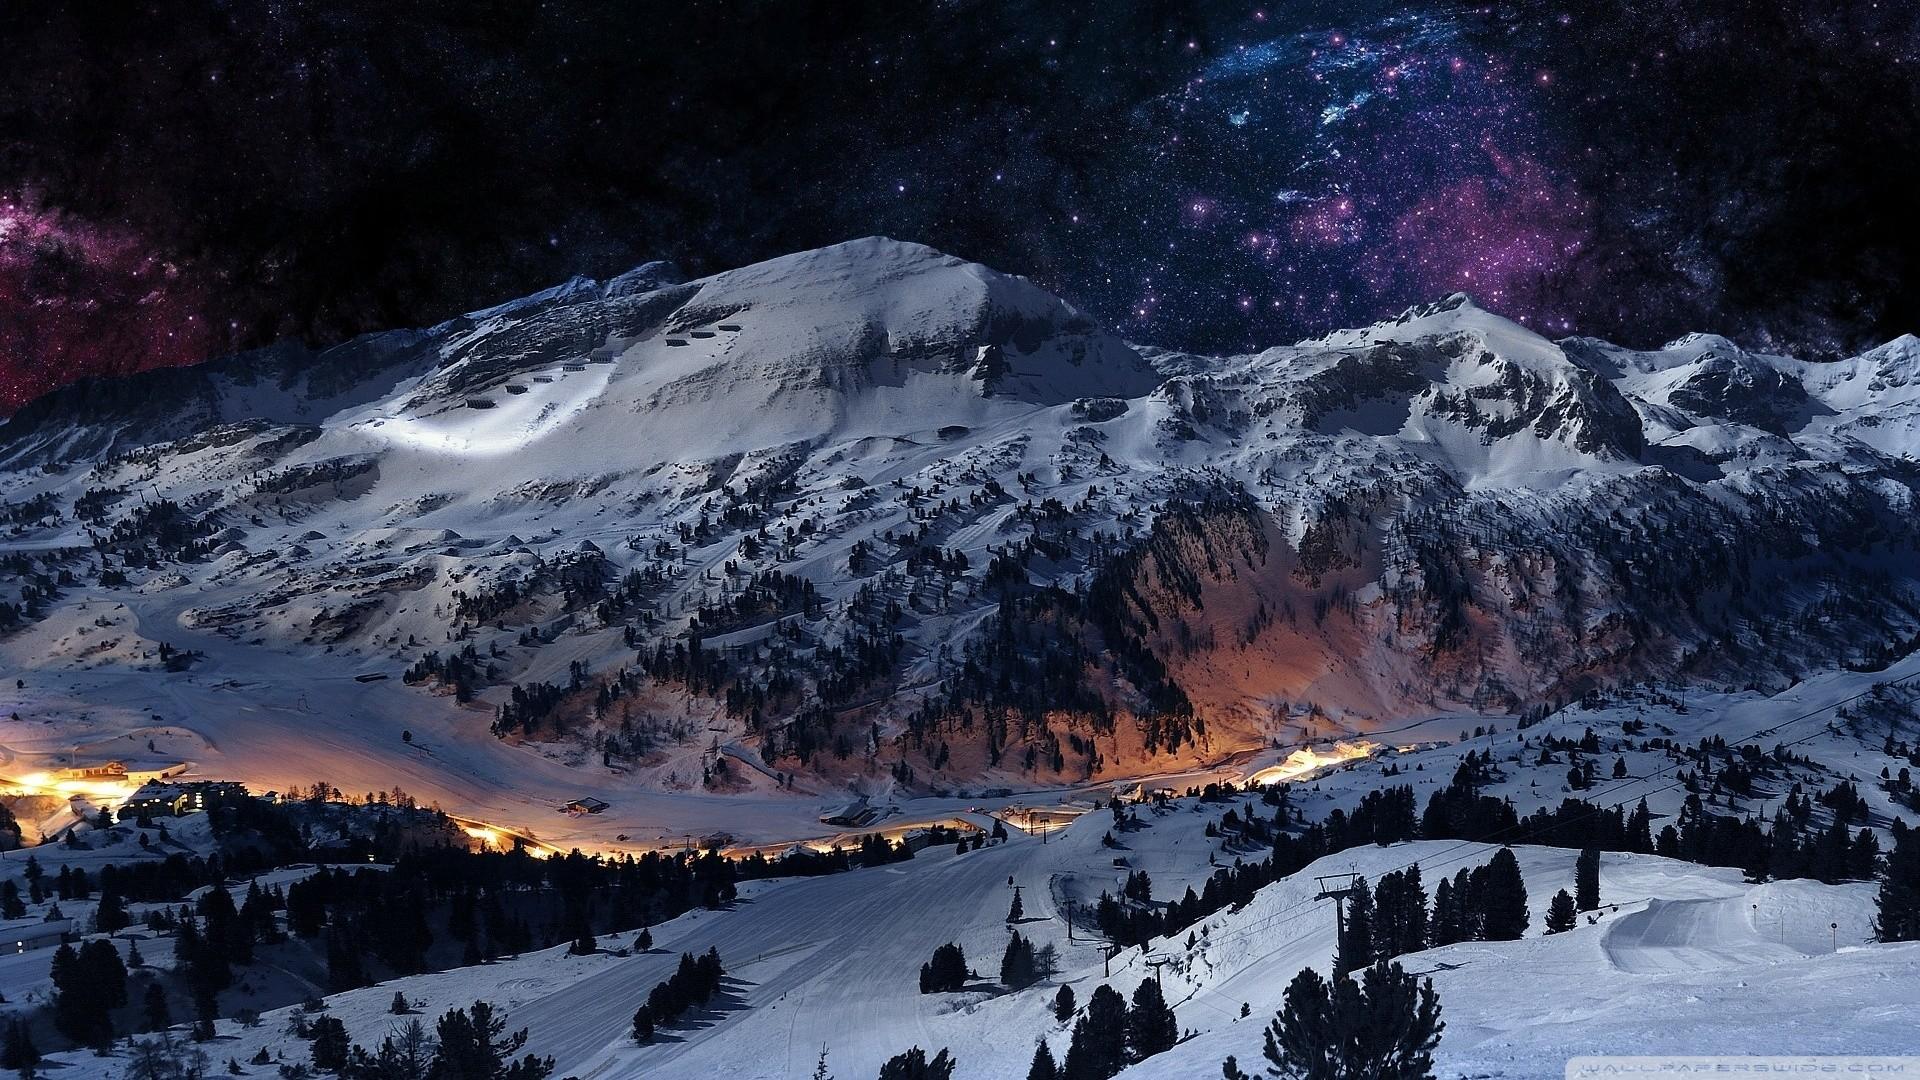 1920x1080 Desktop Wallpaper Snowy Night Scenes Snow Christmas